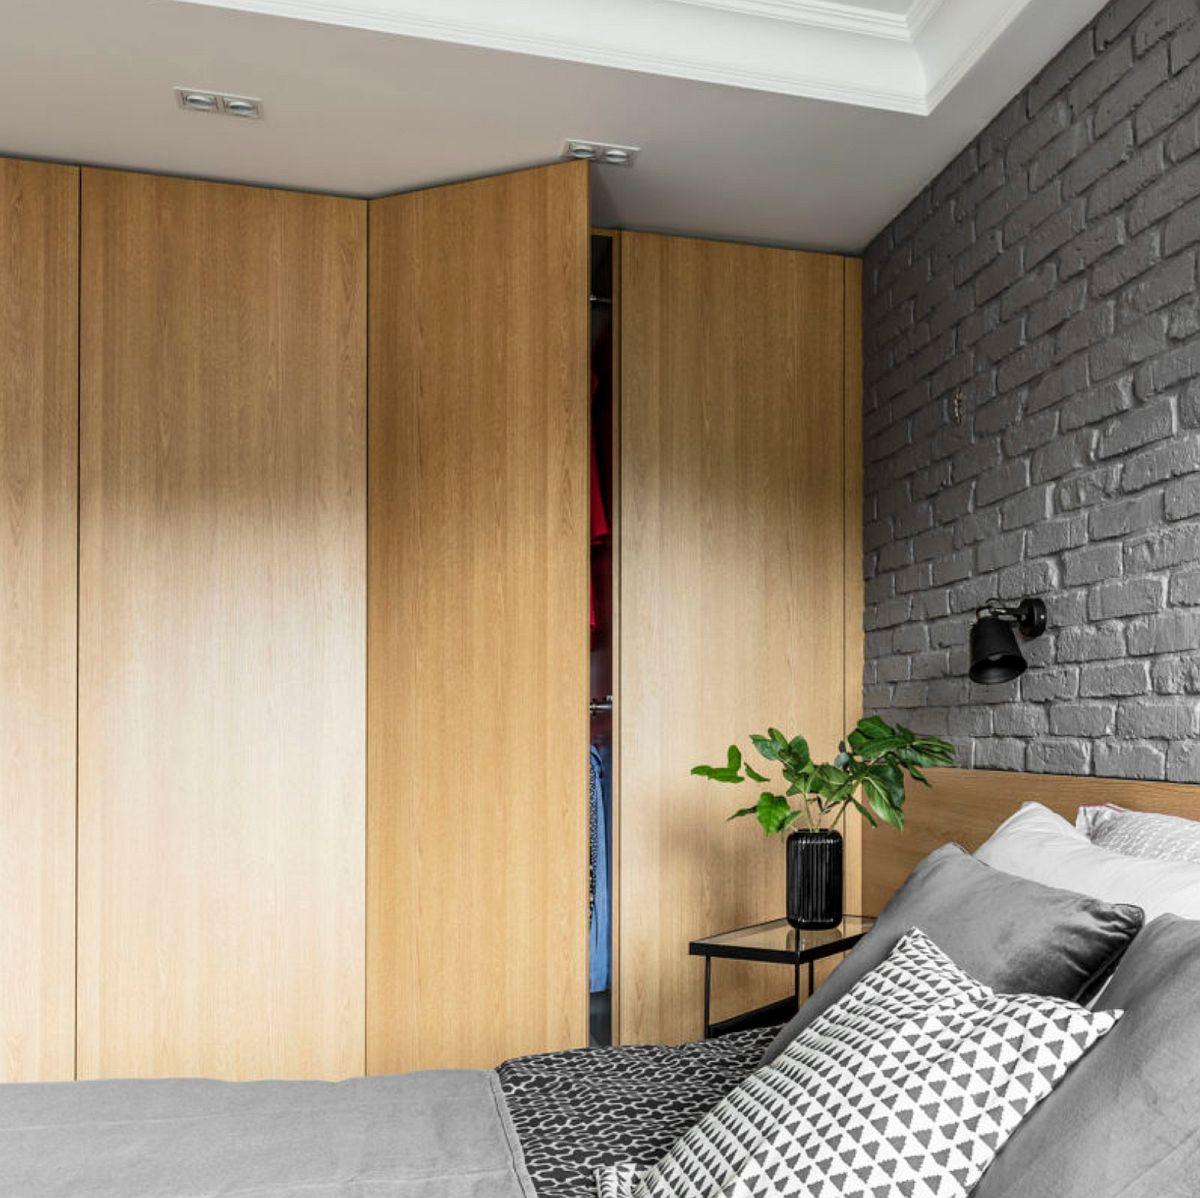 adelaparvu.com despre apartament 56 mp cu accente de rosu, design SAS Wnetrza i Kuchnie, Foto Strazynski Studio (17)